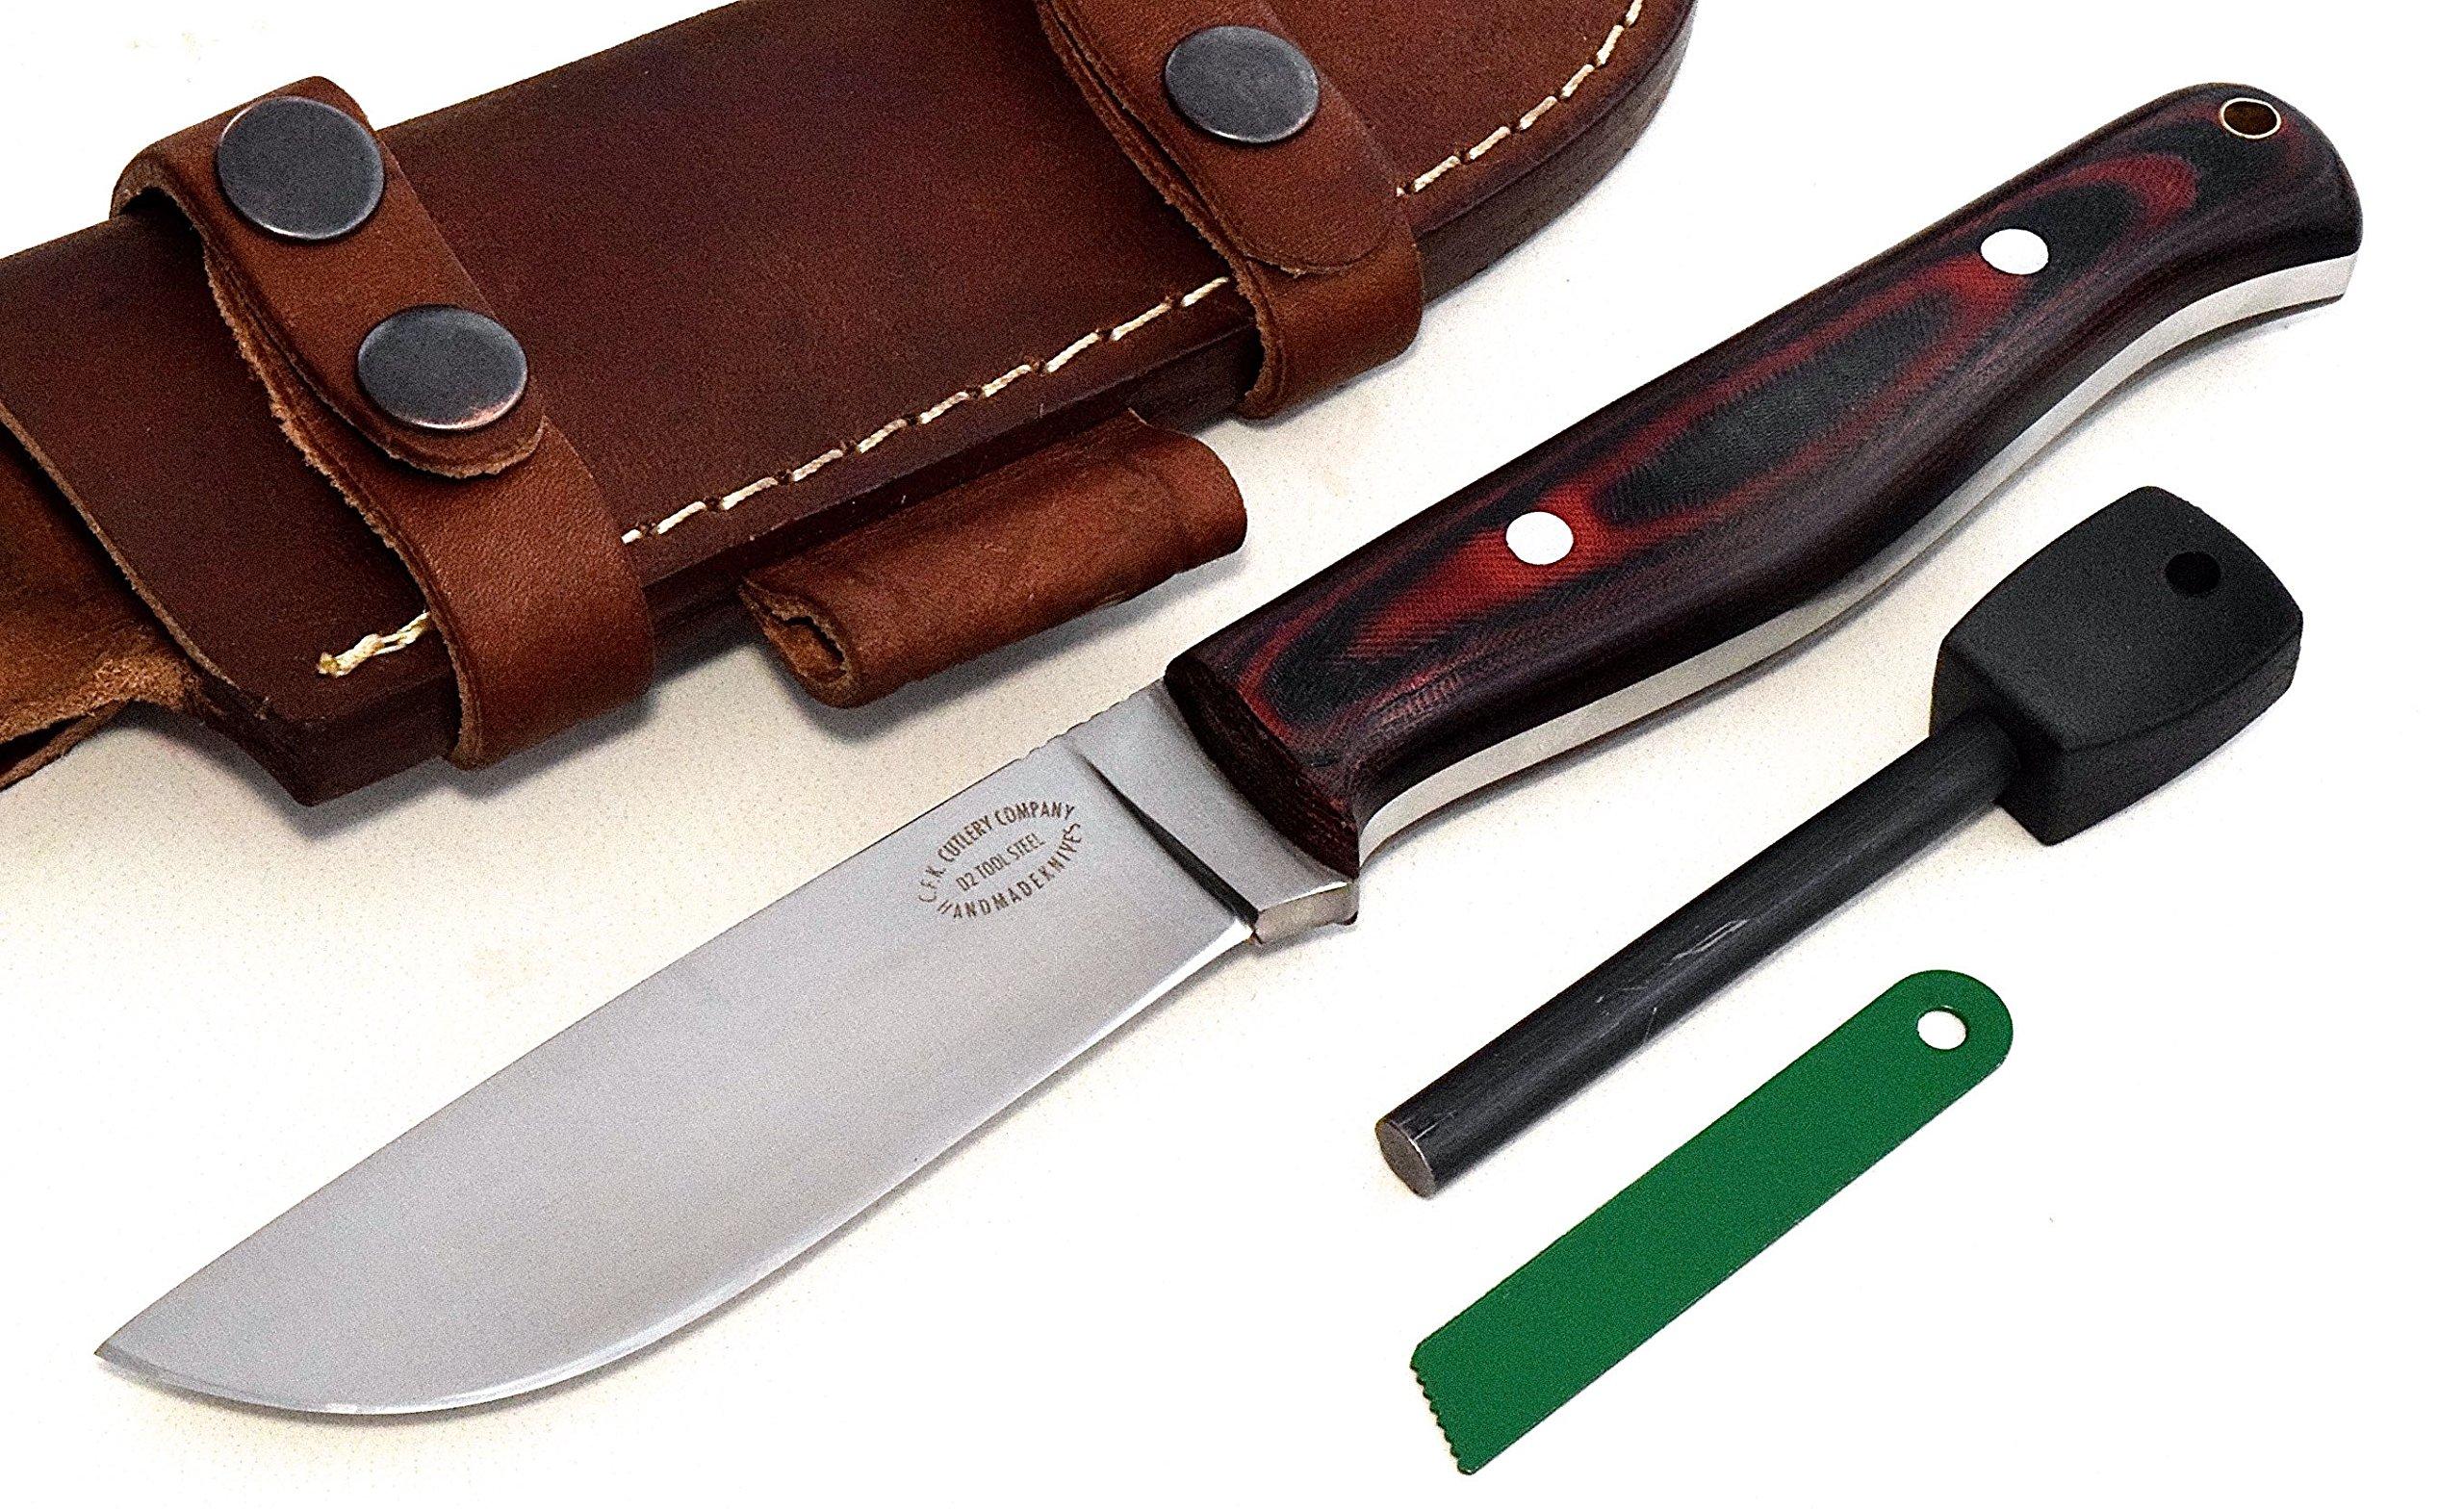 CFK Cutlery Company USA Custom Handmade D2 Tool Steel Micarta BIG PAW Skinning Hunting Fishing Knife & Horizontal Leather Sheath & Fire Starter Set CFK130